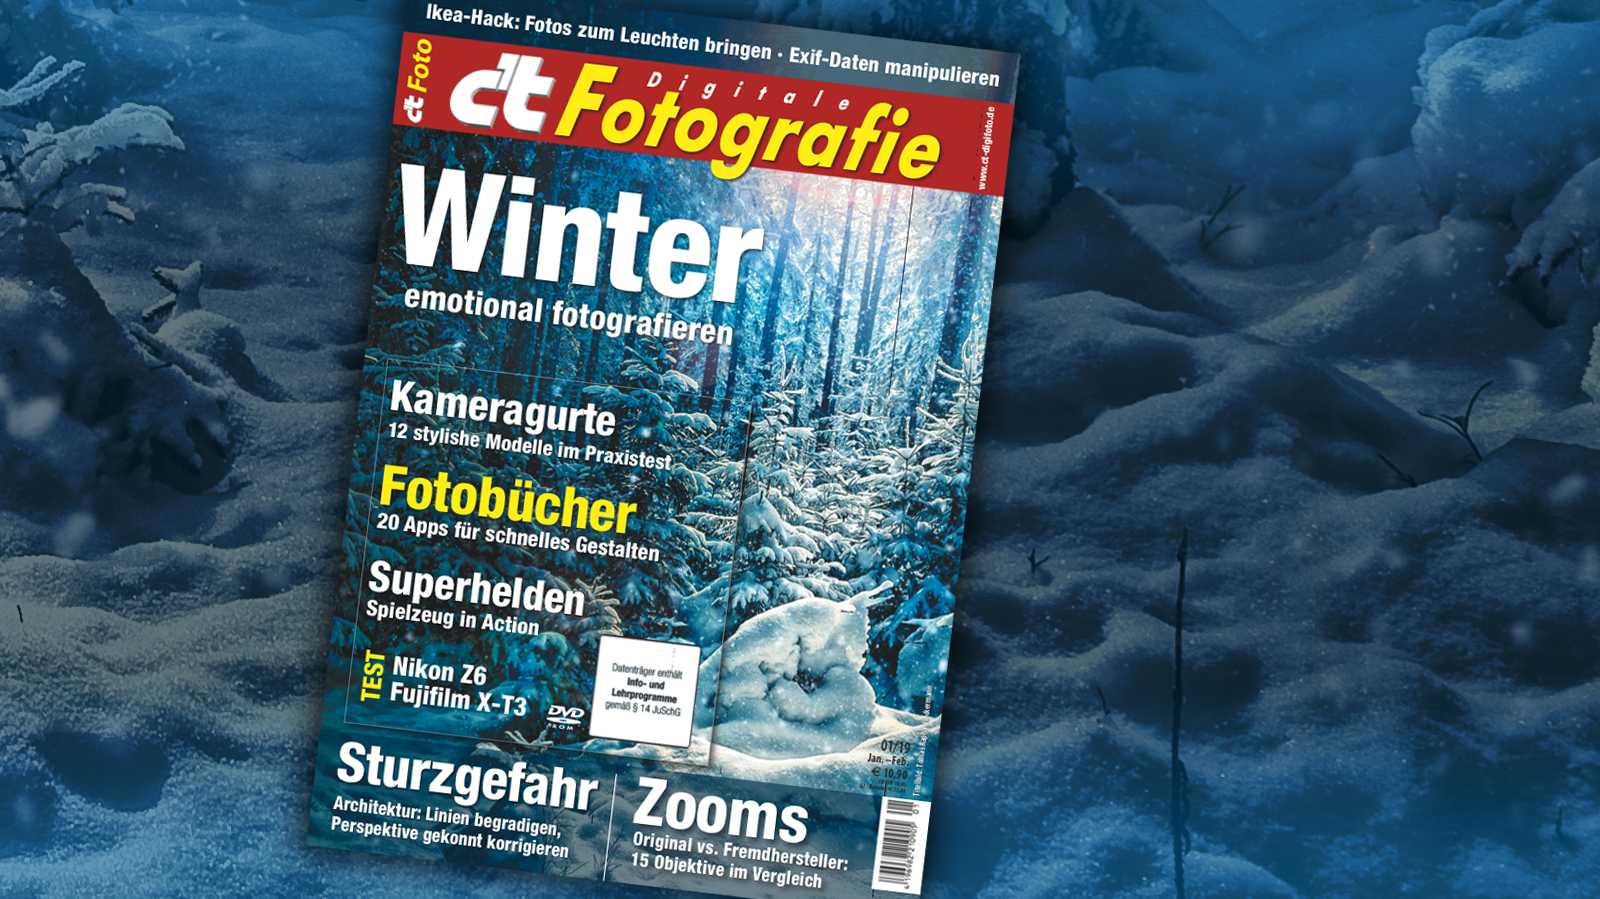 c't Fotografie: Den Winter fotografieren